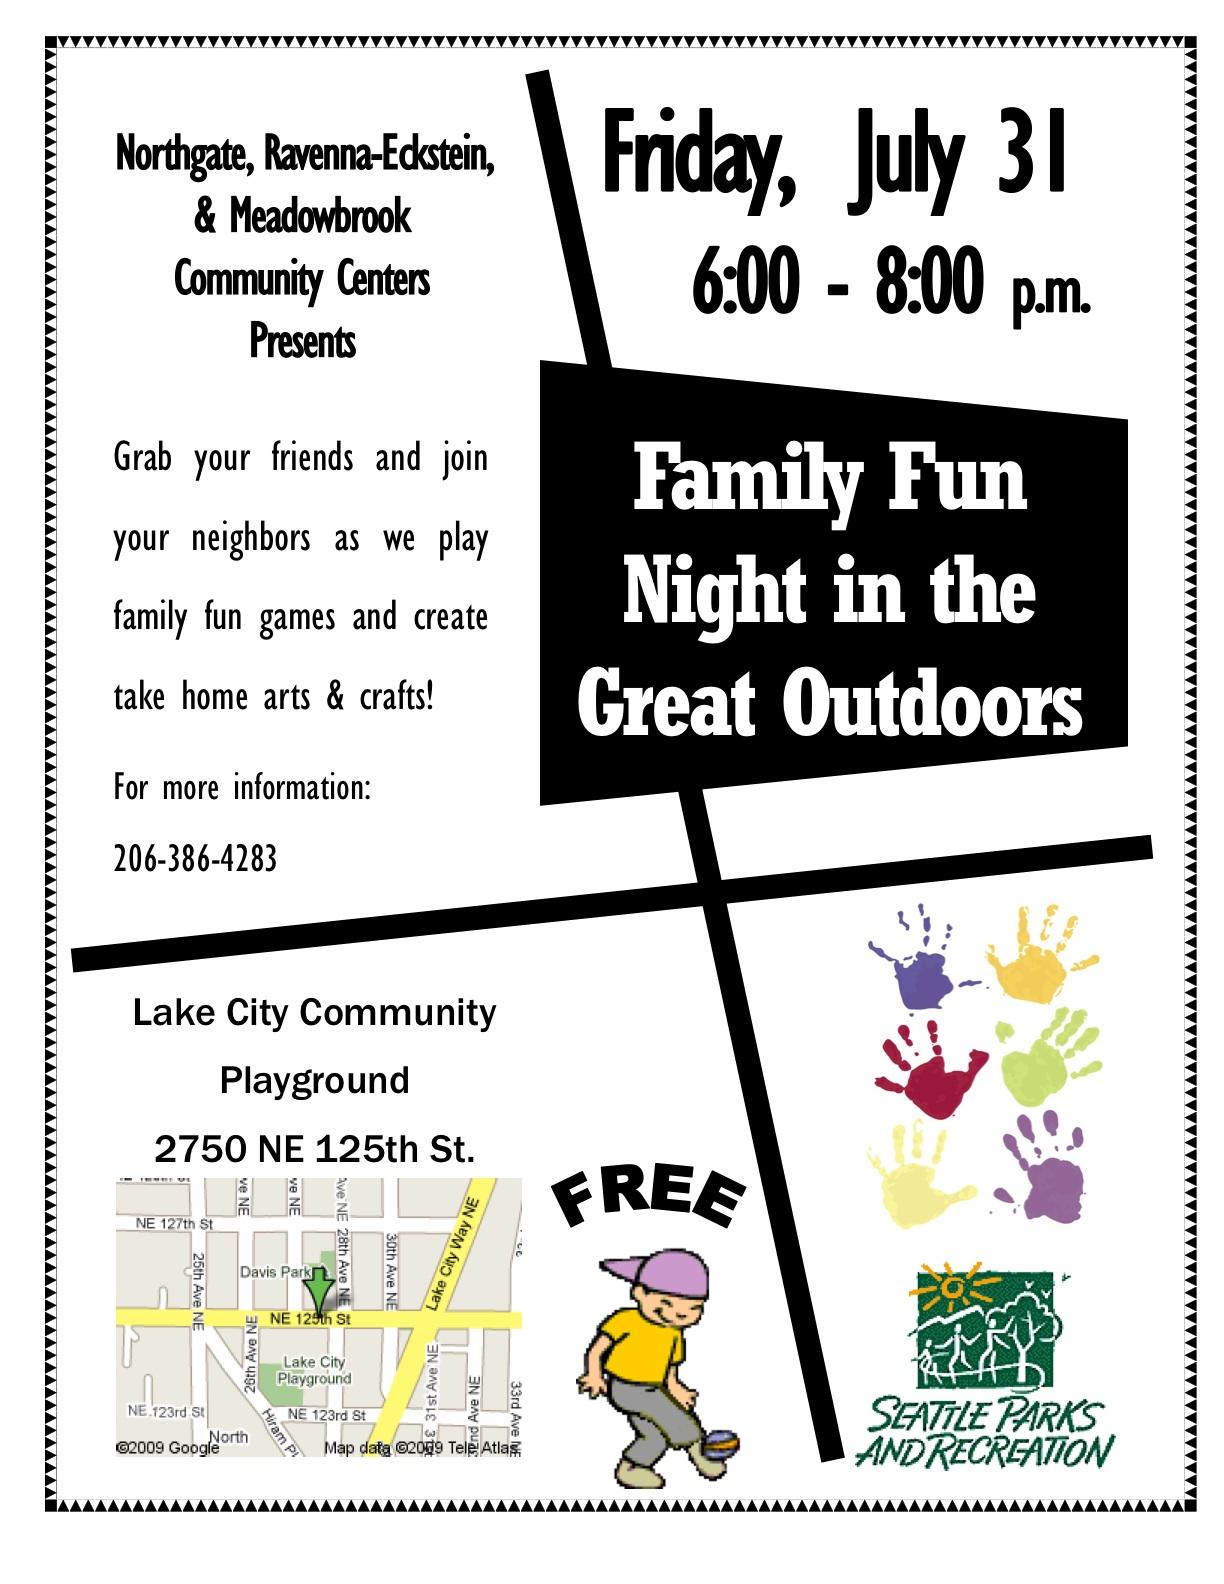 Free family fun: Friday, July 31st « Pinehurst Seattle